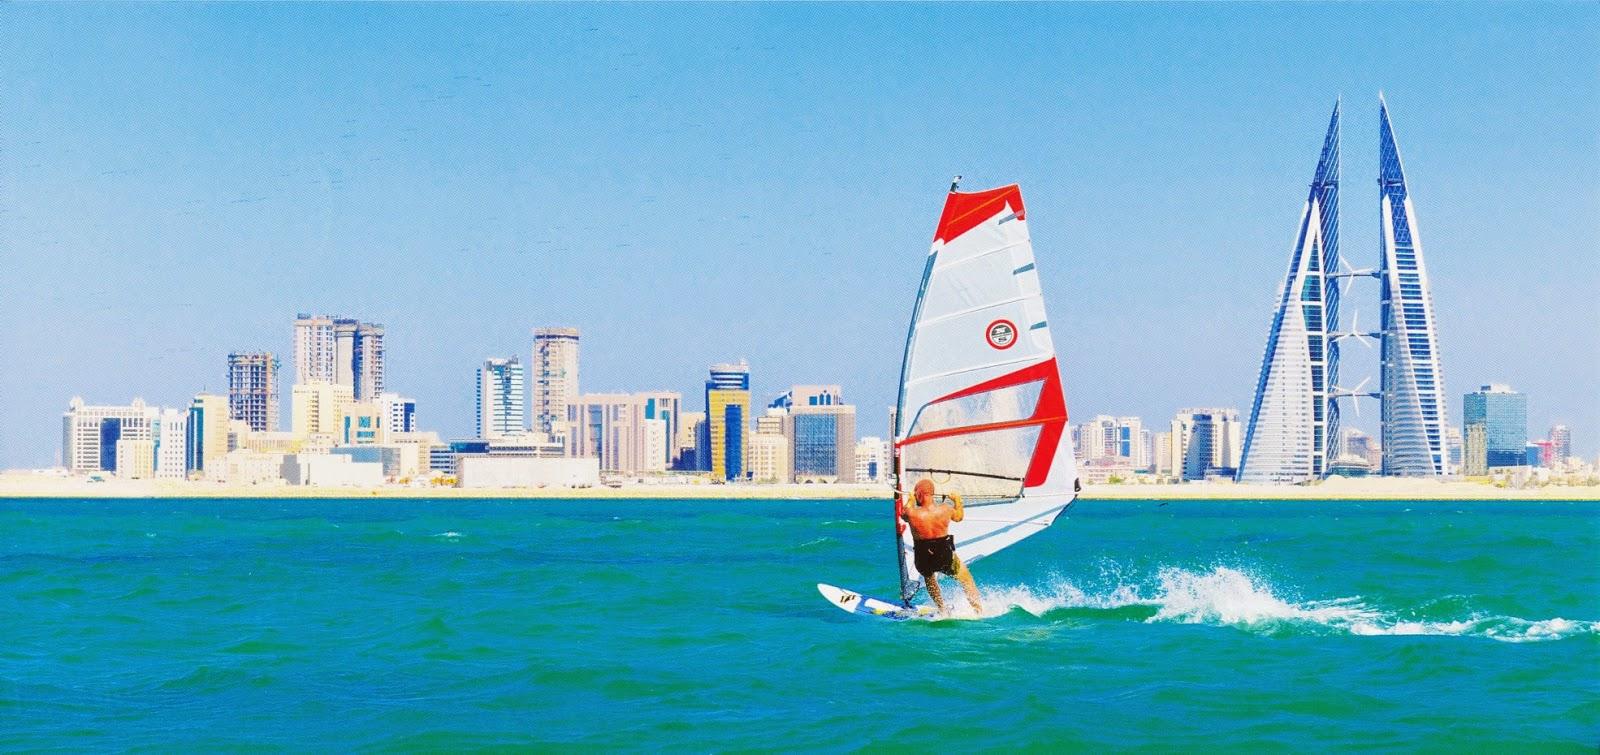 bahrain, manama, surfer, world trade center